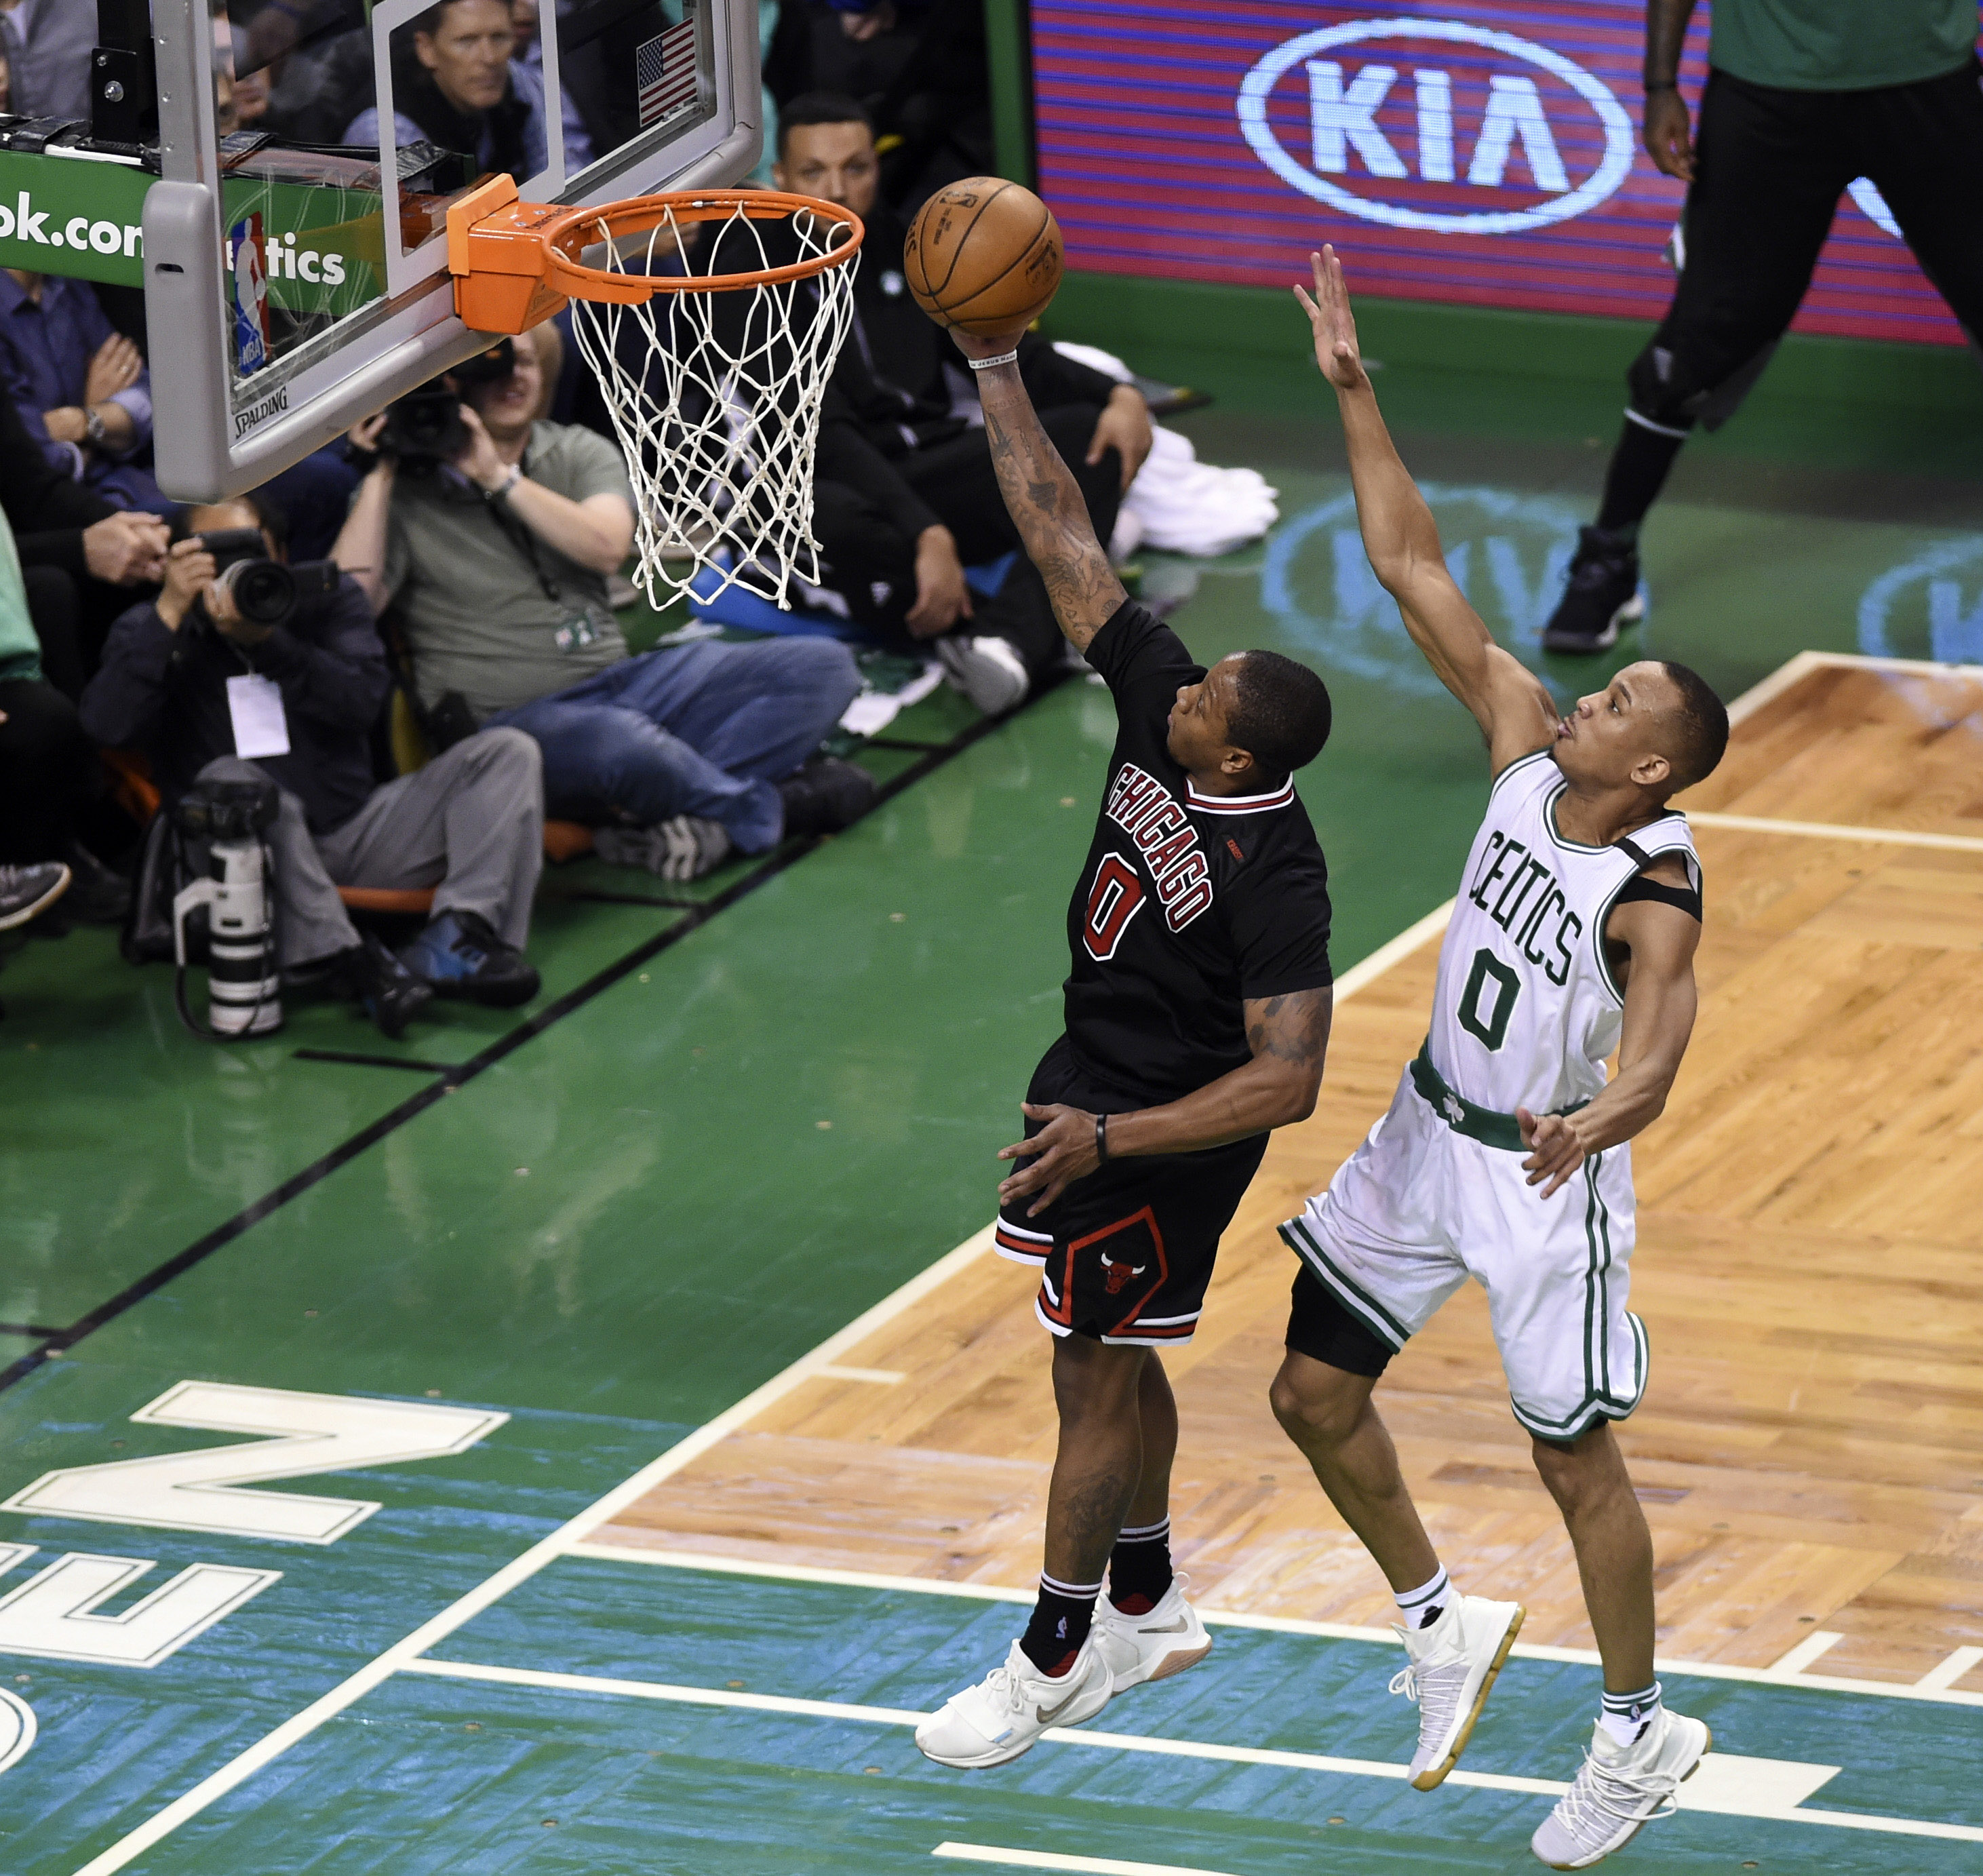 10032635-nba-playoffs-chicago-bulls-at-boston-celtics